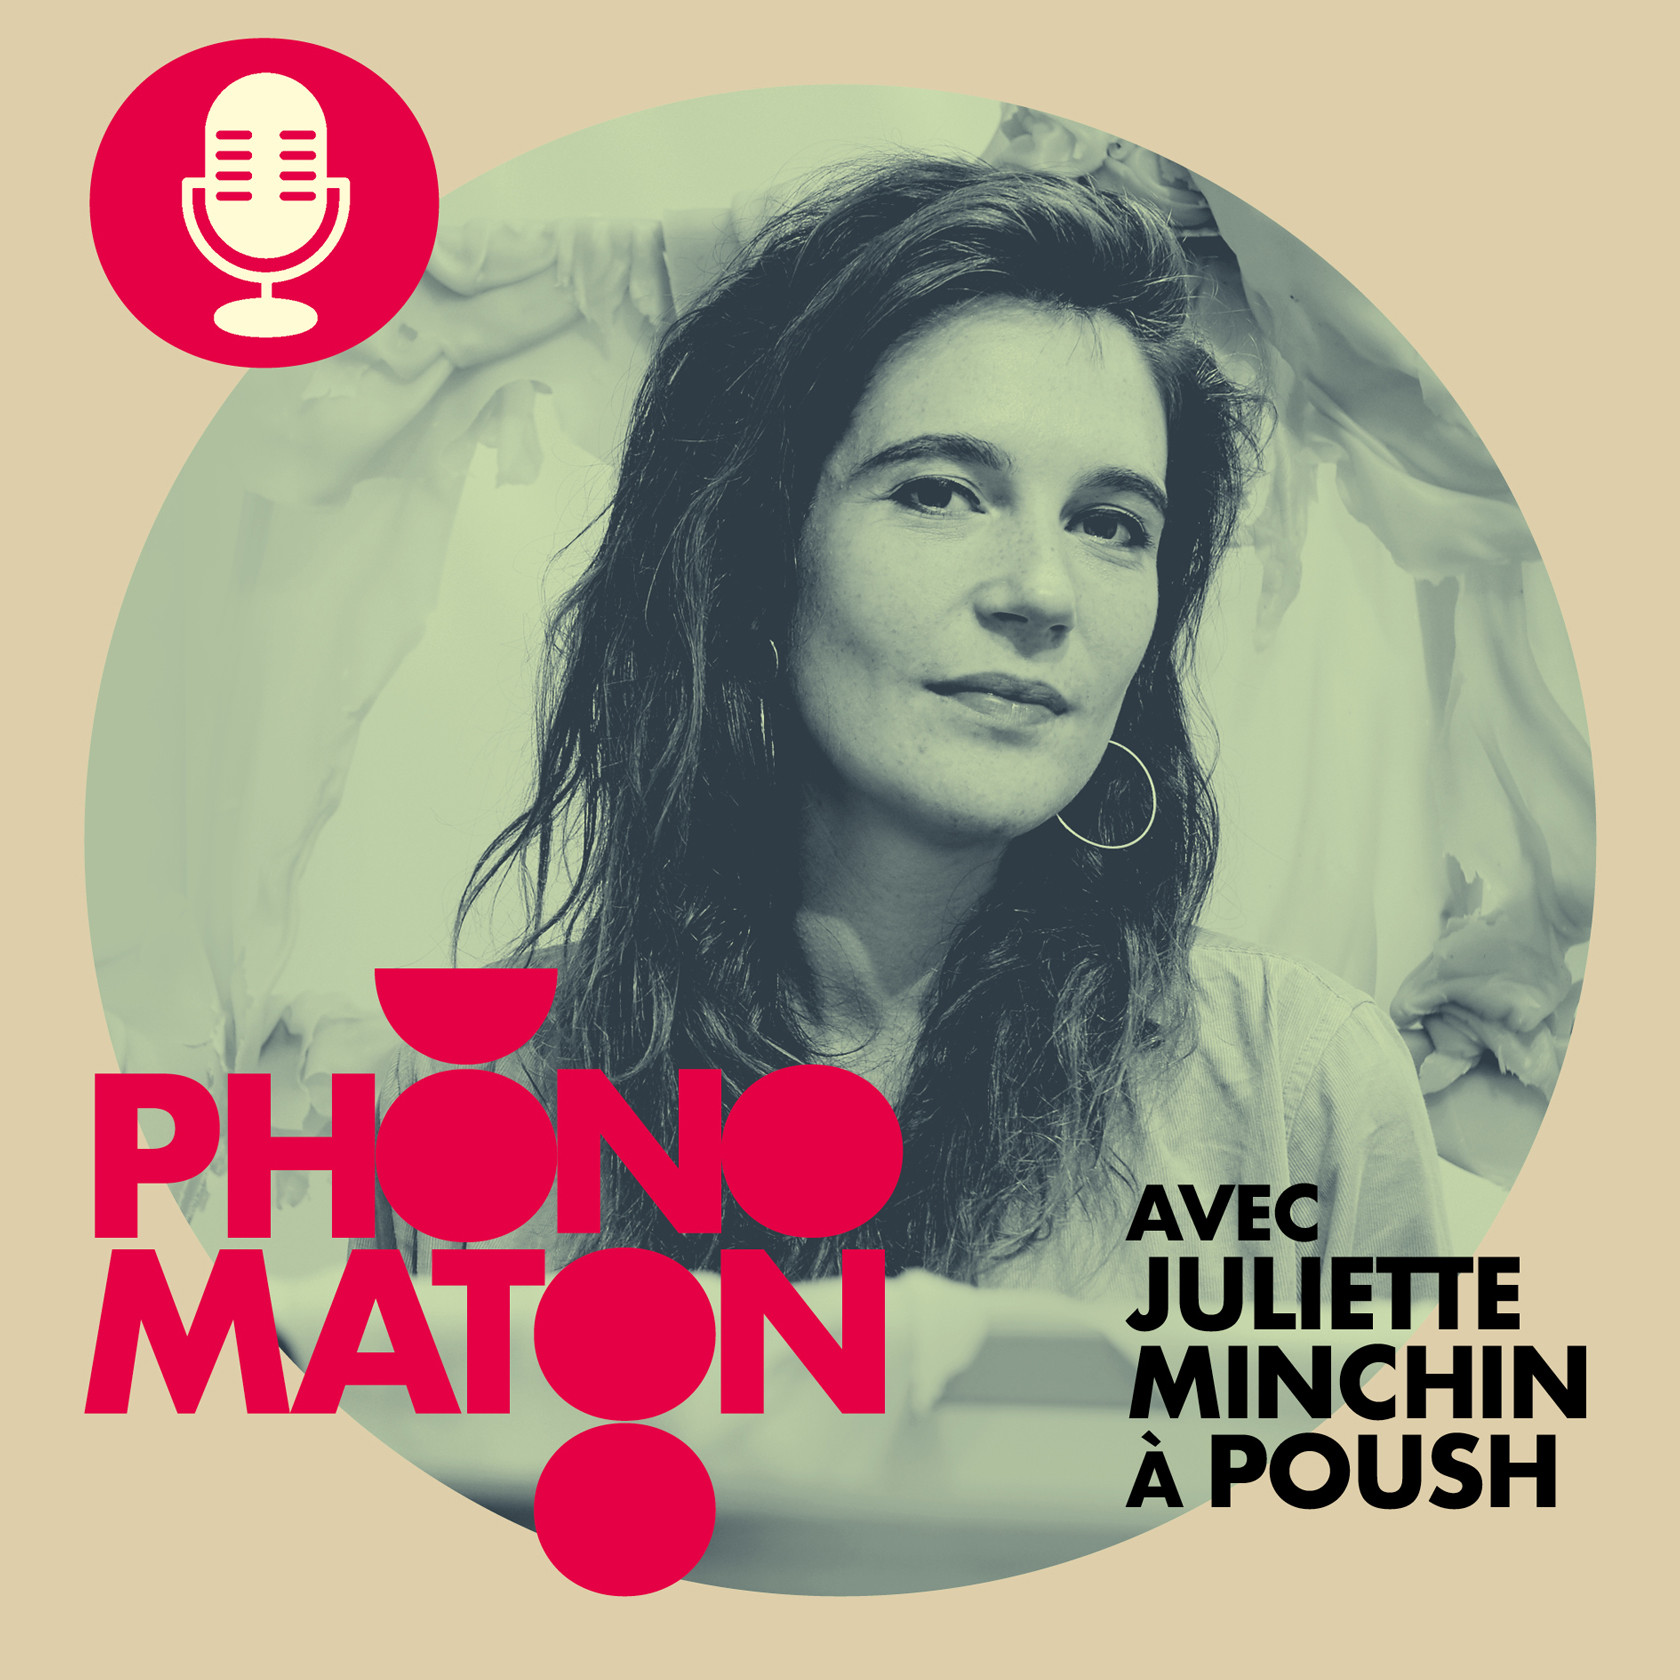 Phonomaton avec Juliette Minchin à Poush